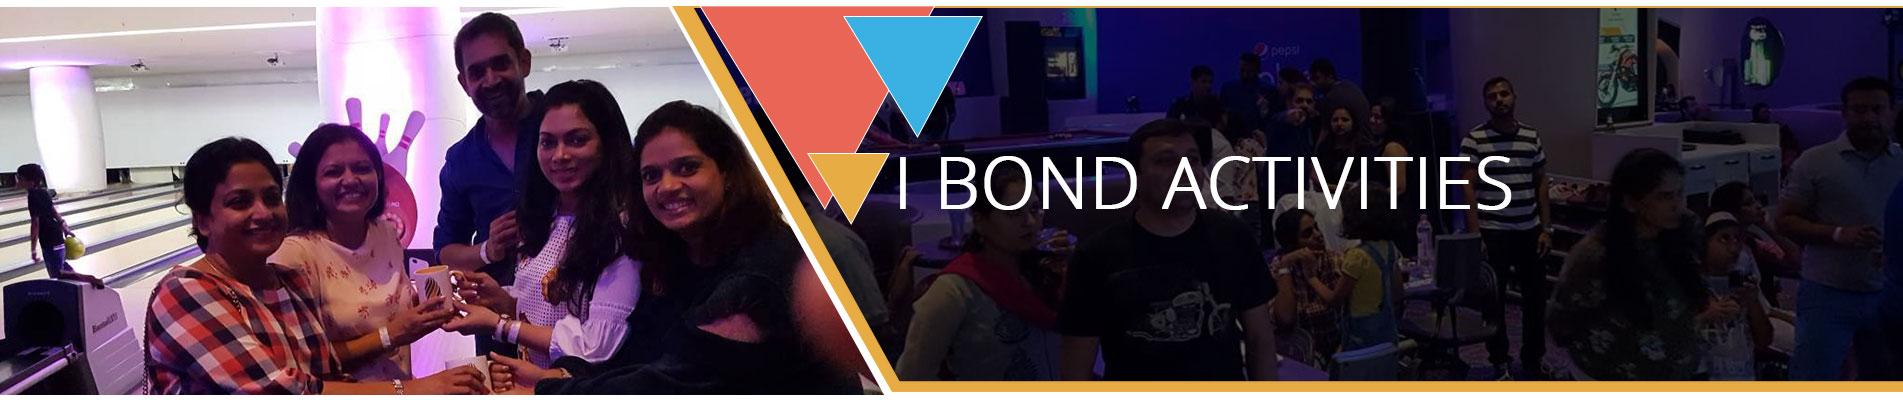 I Bond Activities